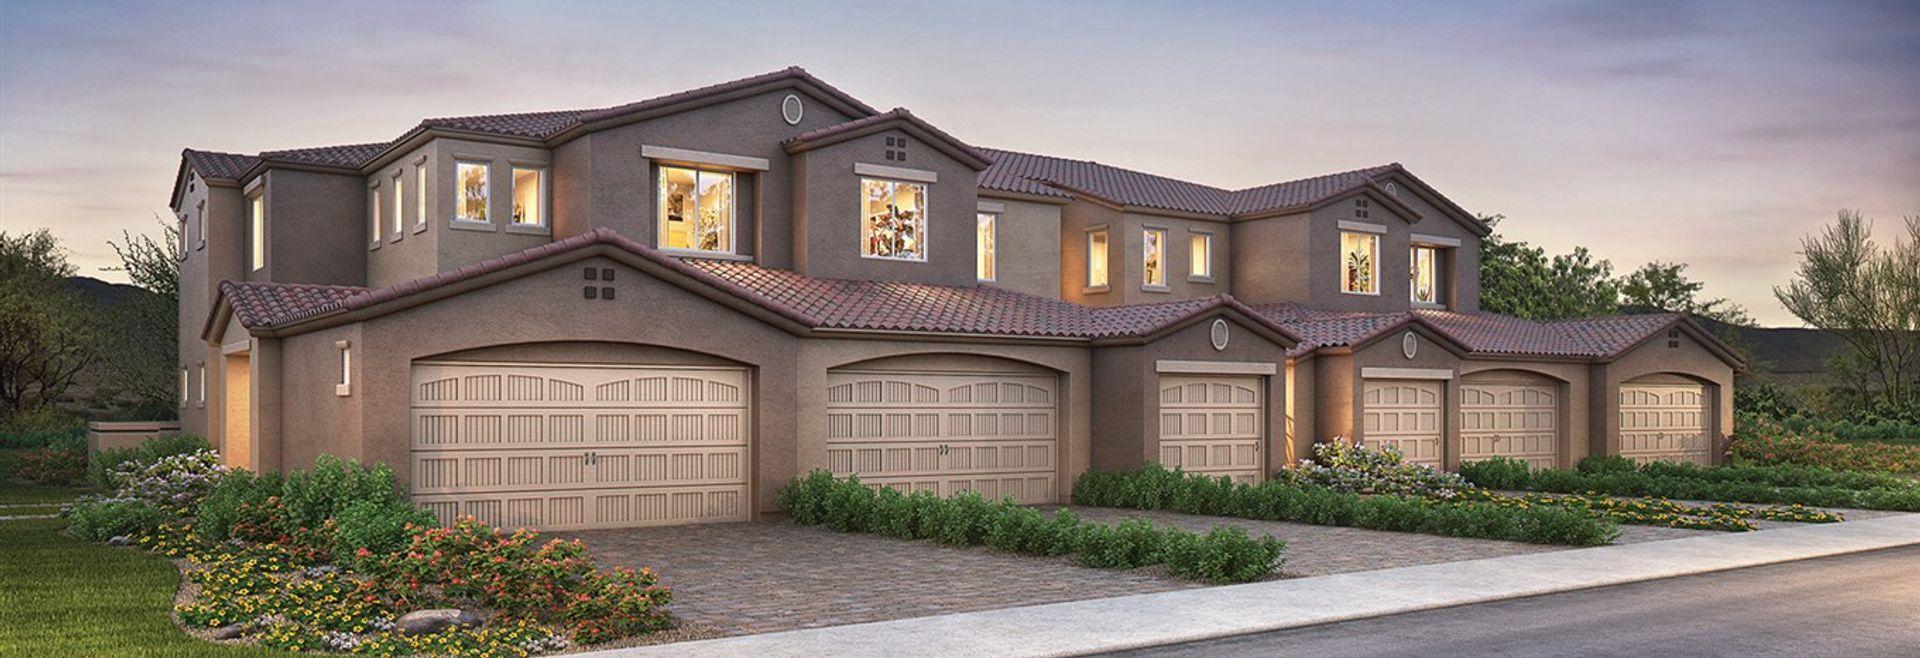 Carino Villas by Shea Homes in Chandler, Arizona